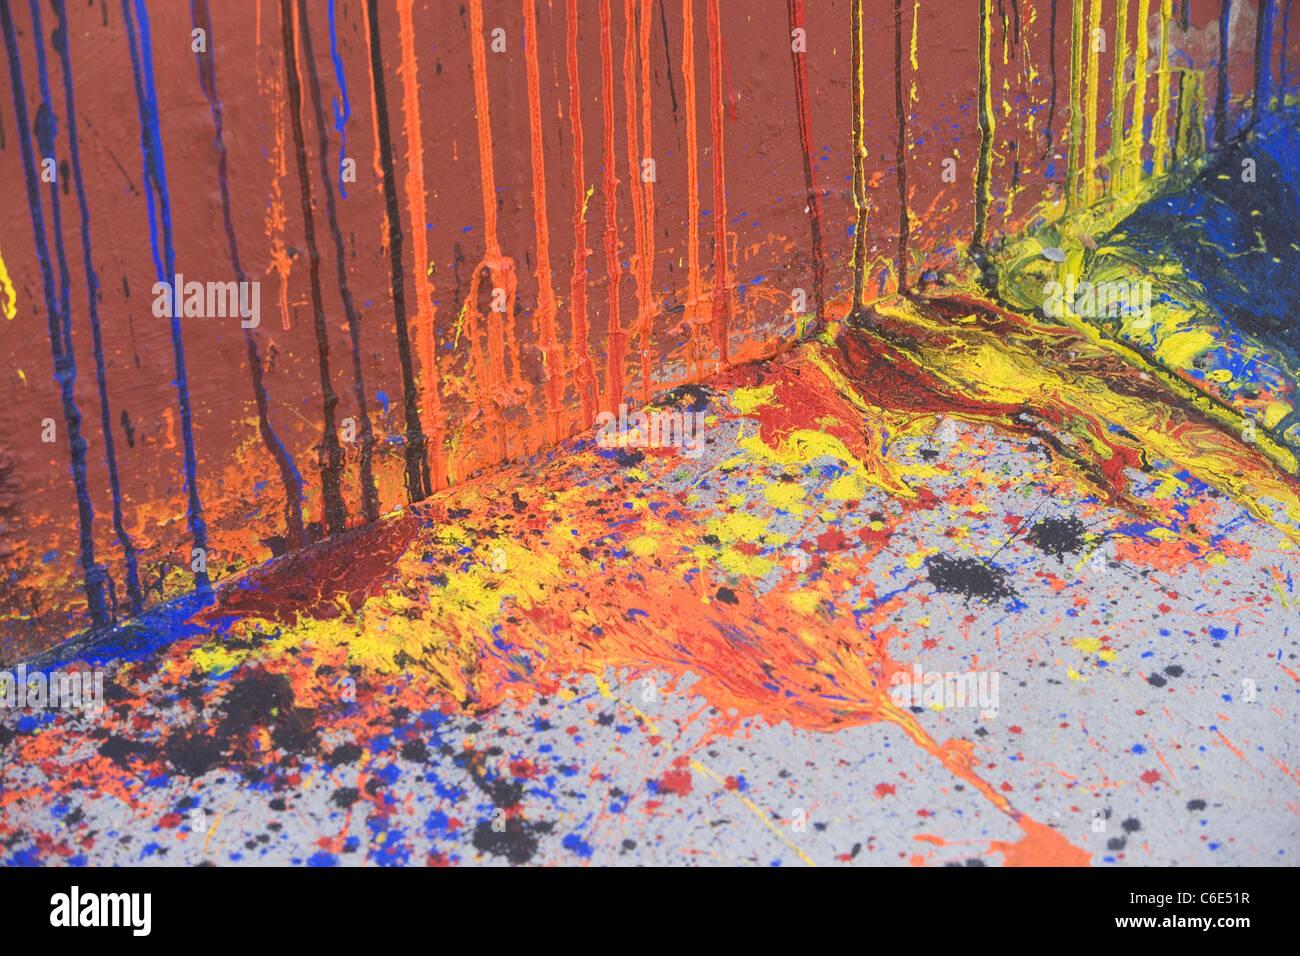 USA, New York State, New York City, tropfende Farbe auf Wand und asphalt Stockbild